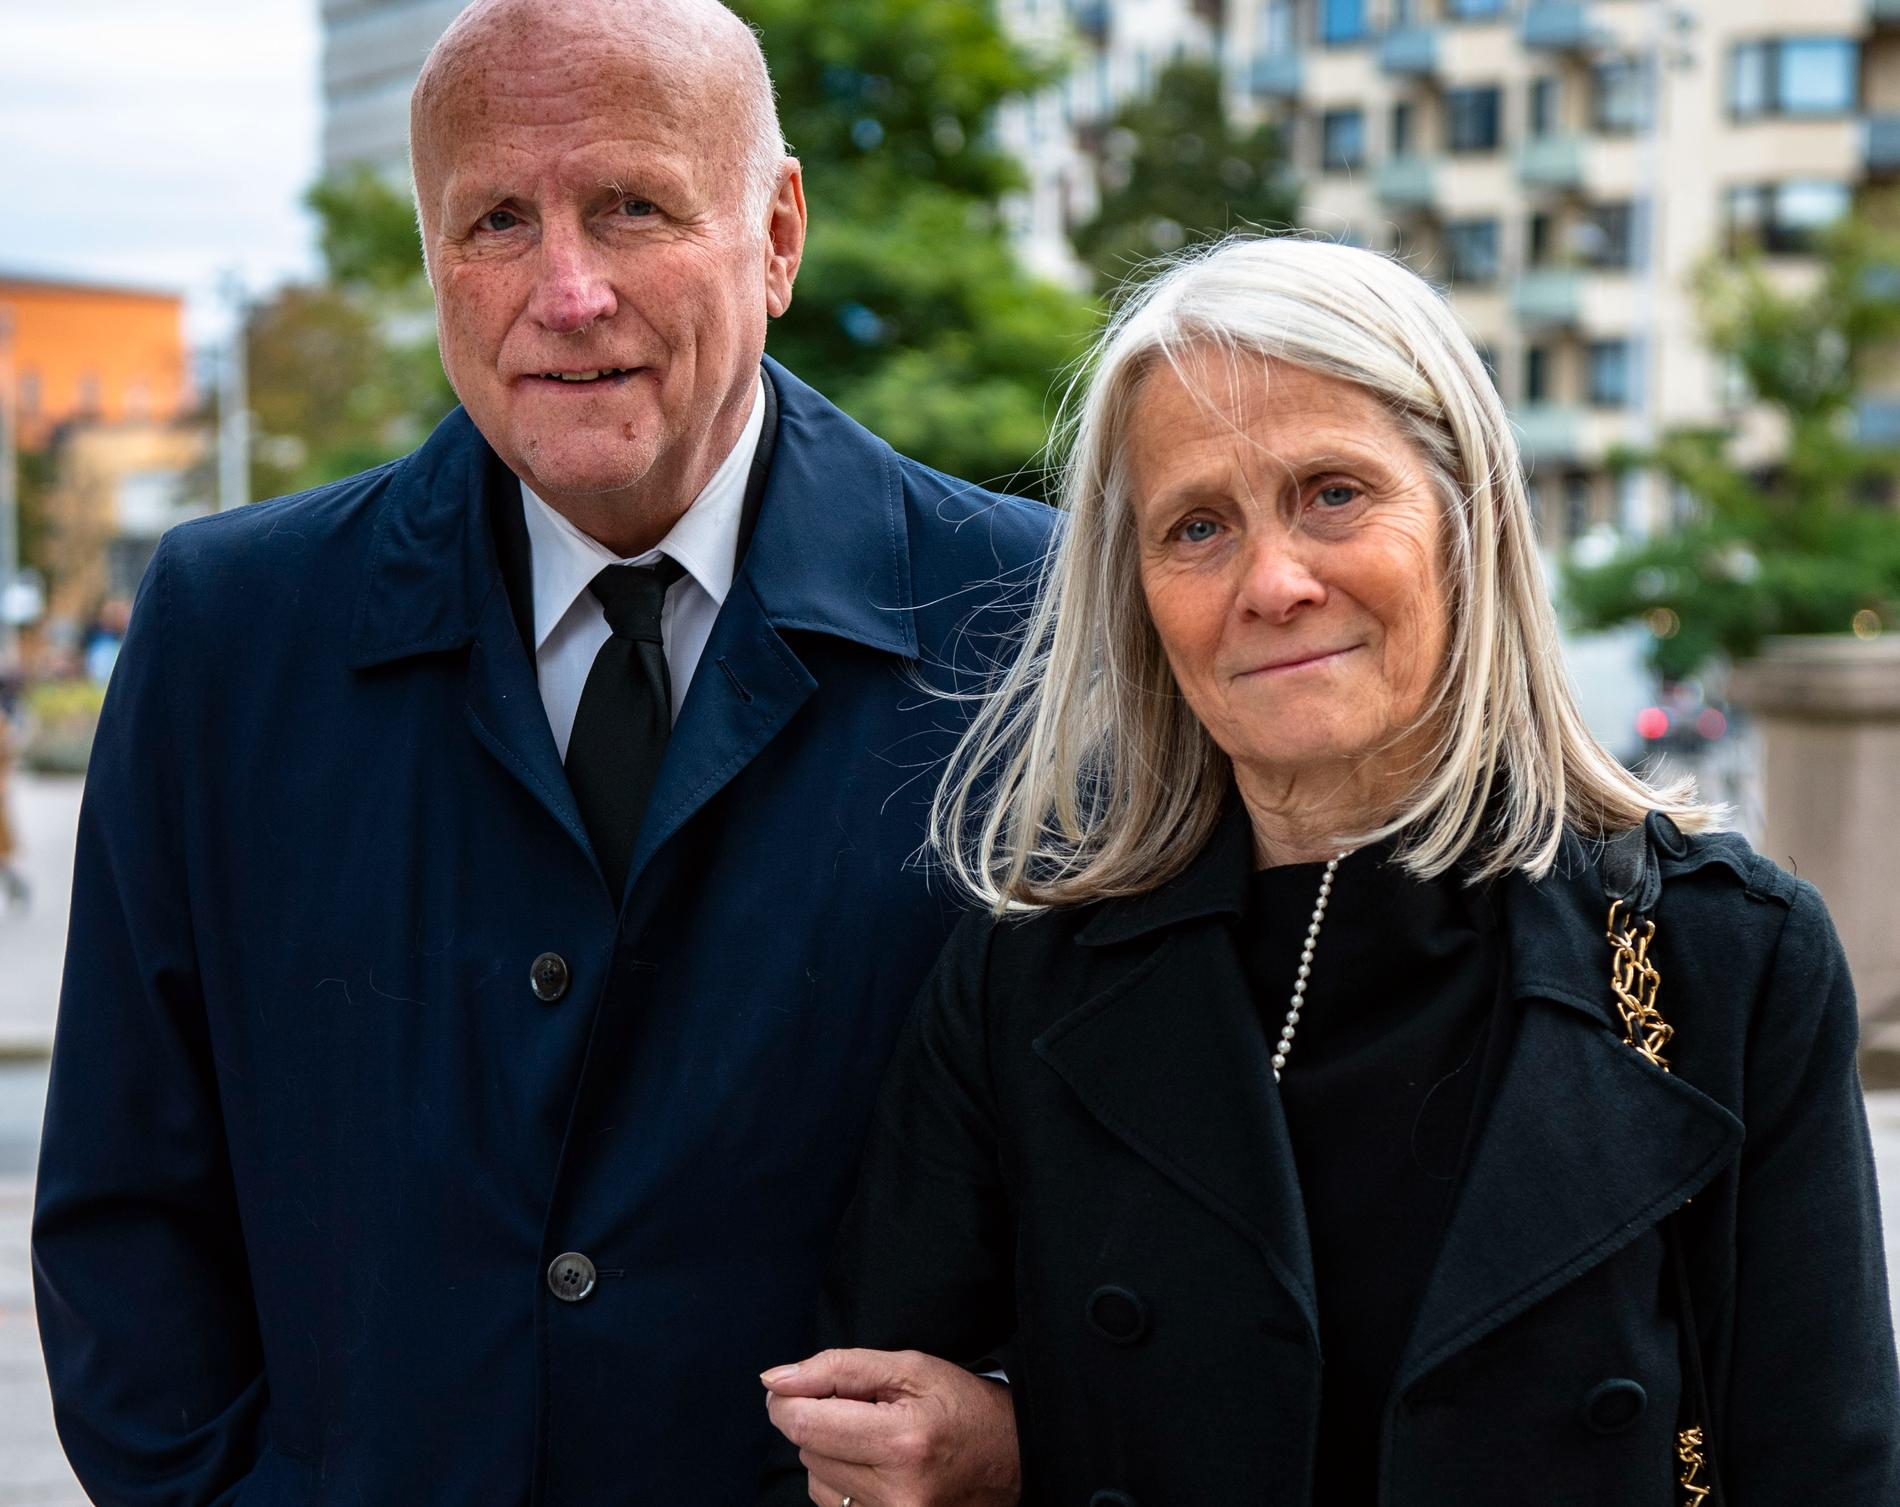 Arne och Kerstin Hegerfors